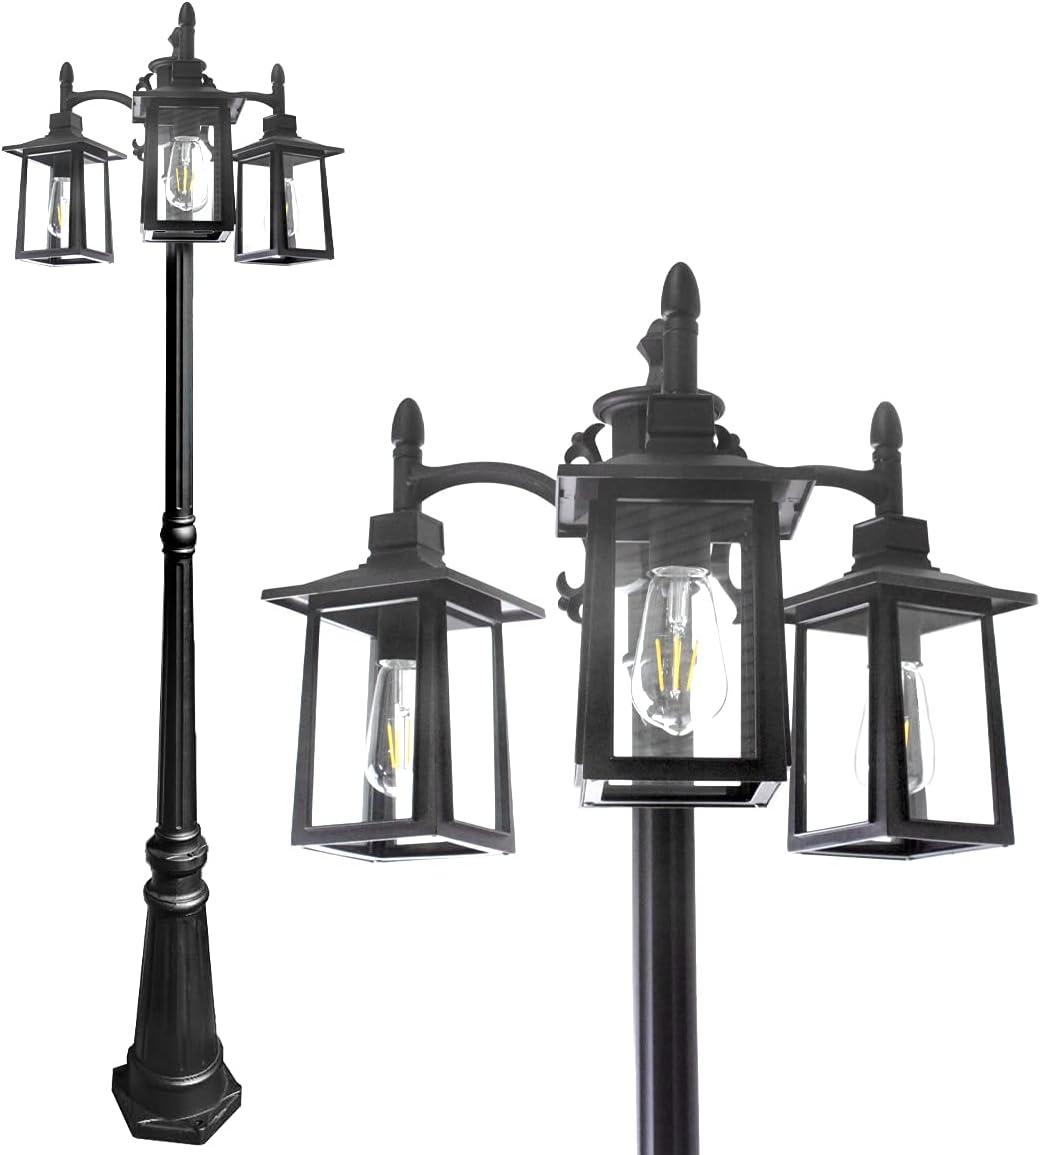 Led Street Light Max 54% OFF Triple-Head Post 2700K 1100lumens shop Outdoor